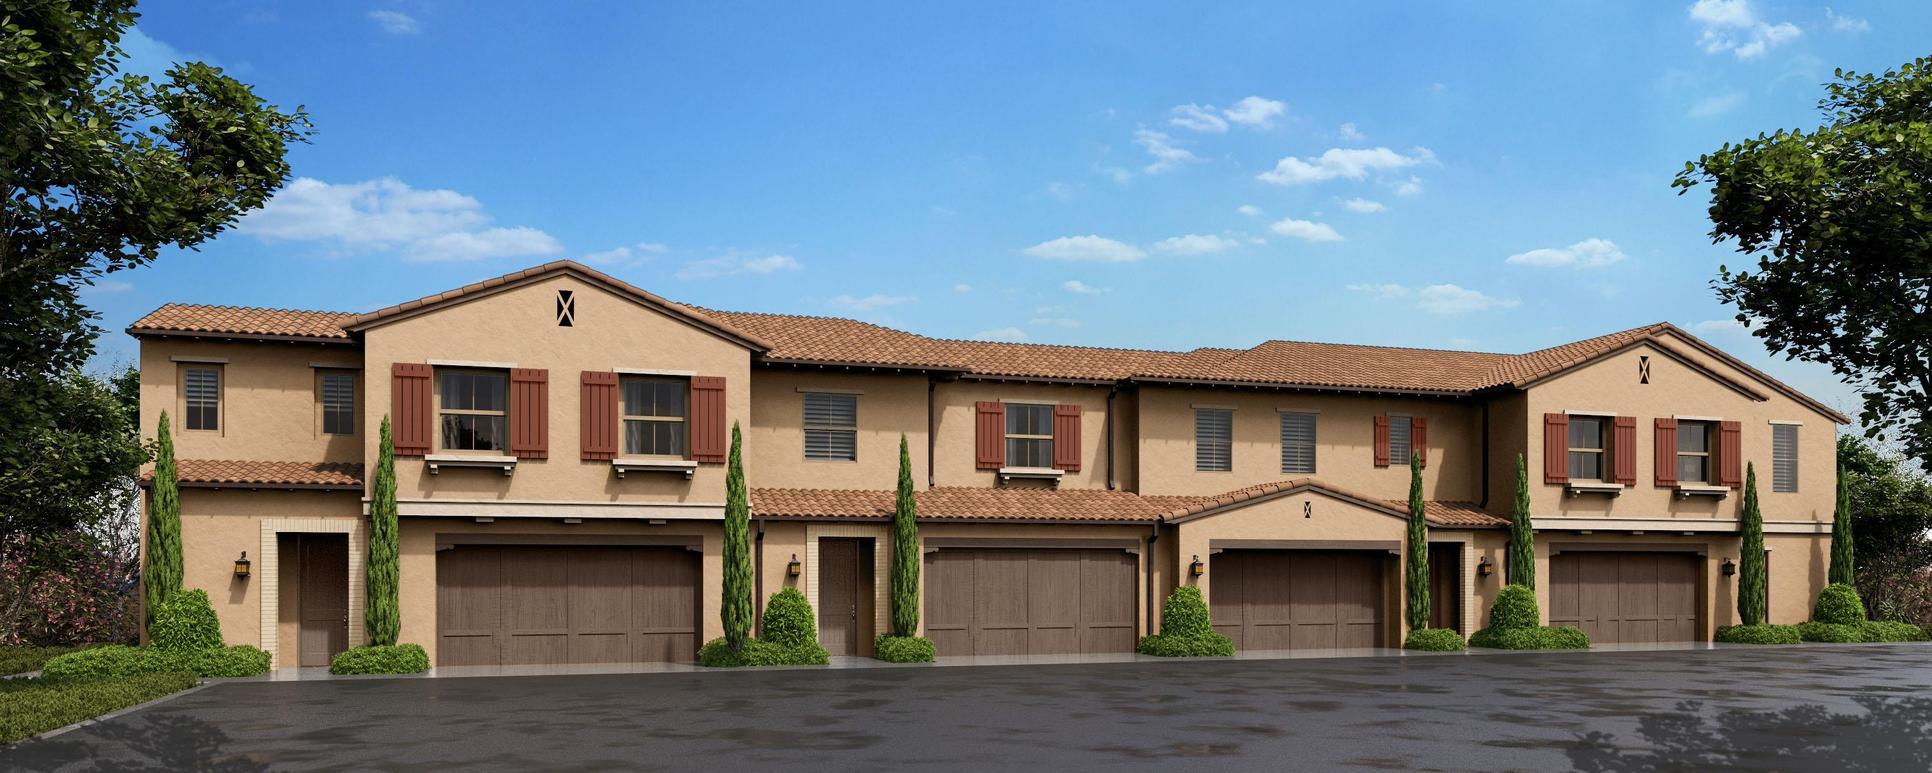 Residence 3C:Elevation